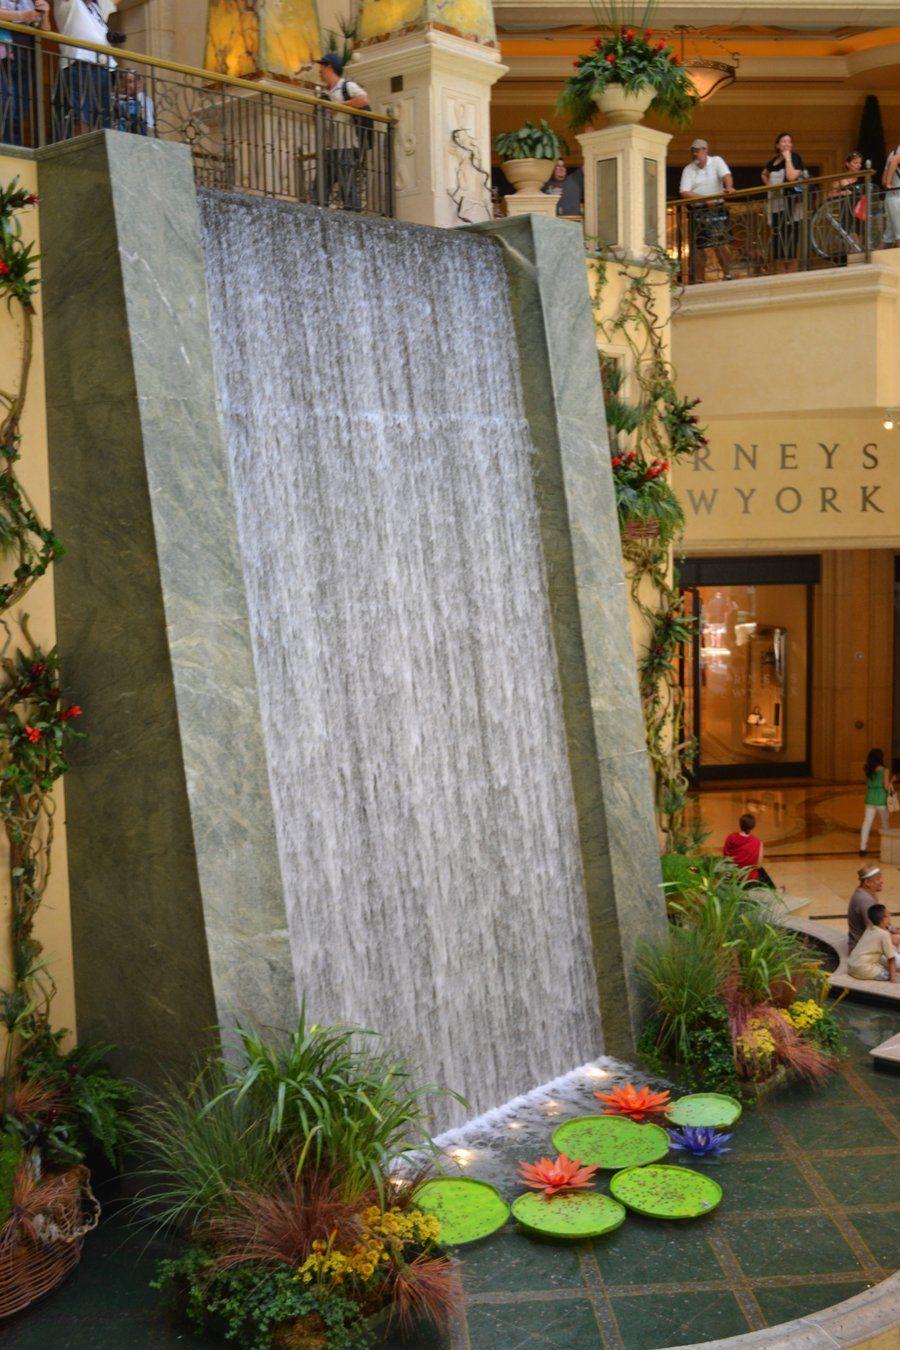 Indoor waterfall by draculasbride01 on deviantart - Waterfall designs for indoor ...